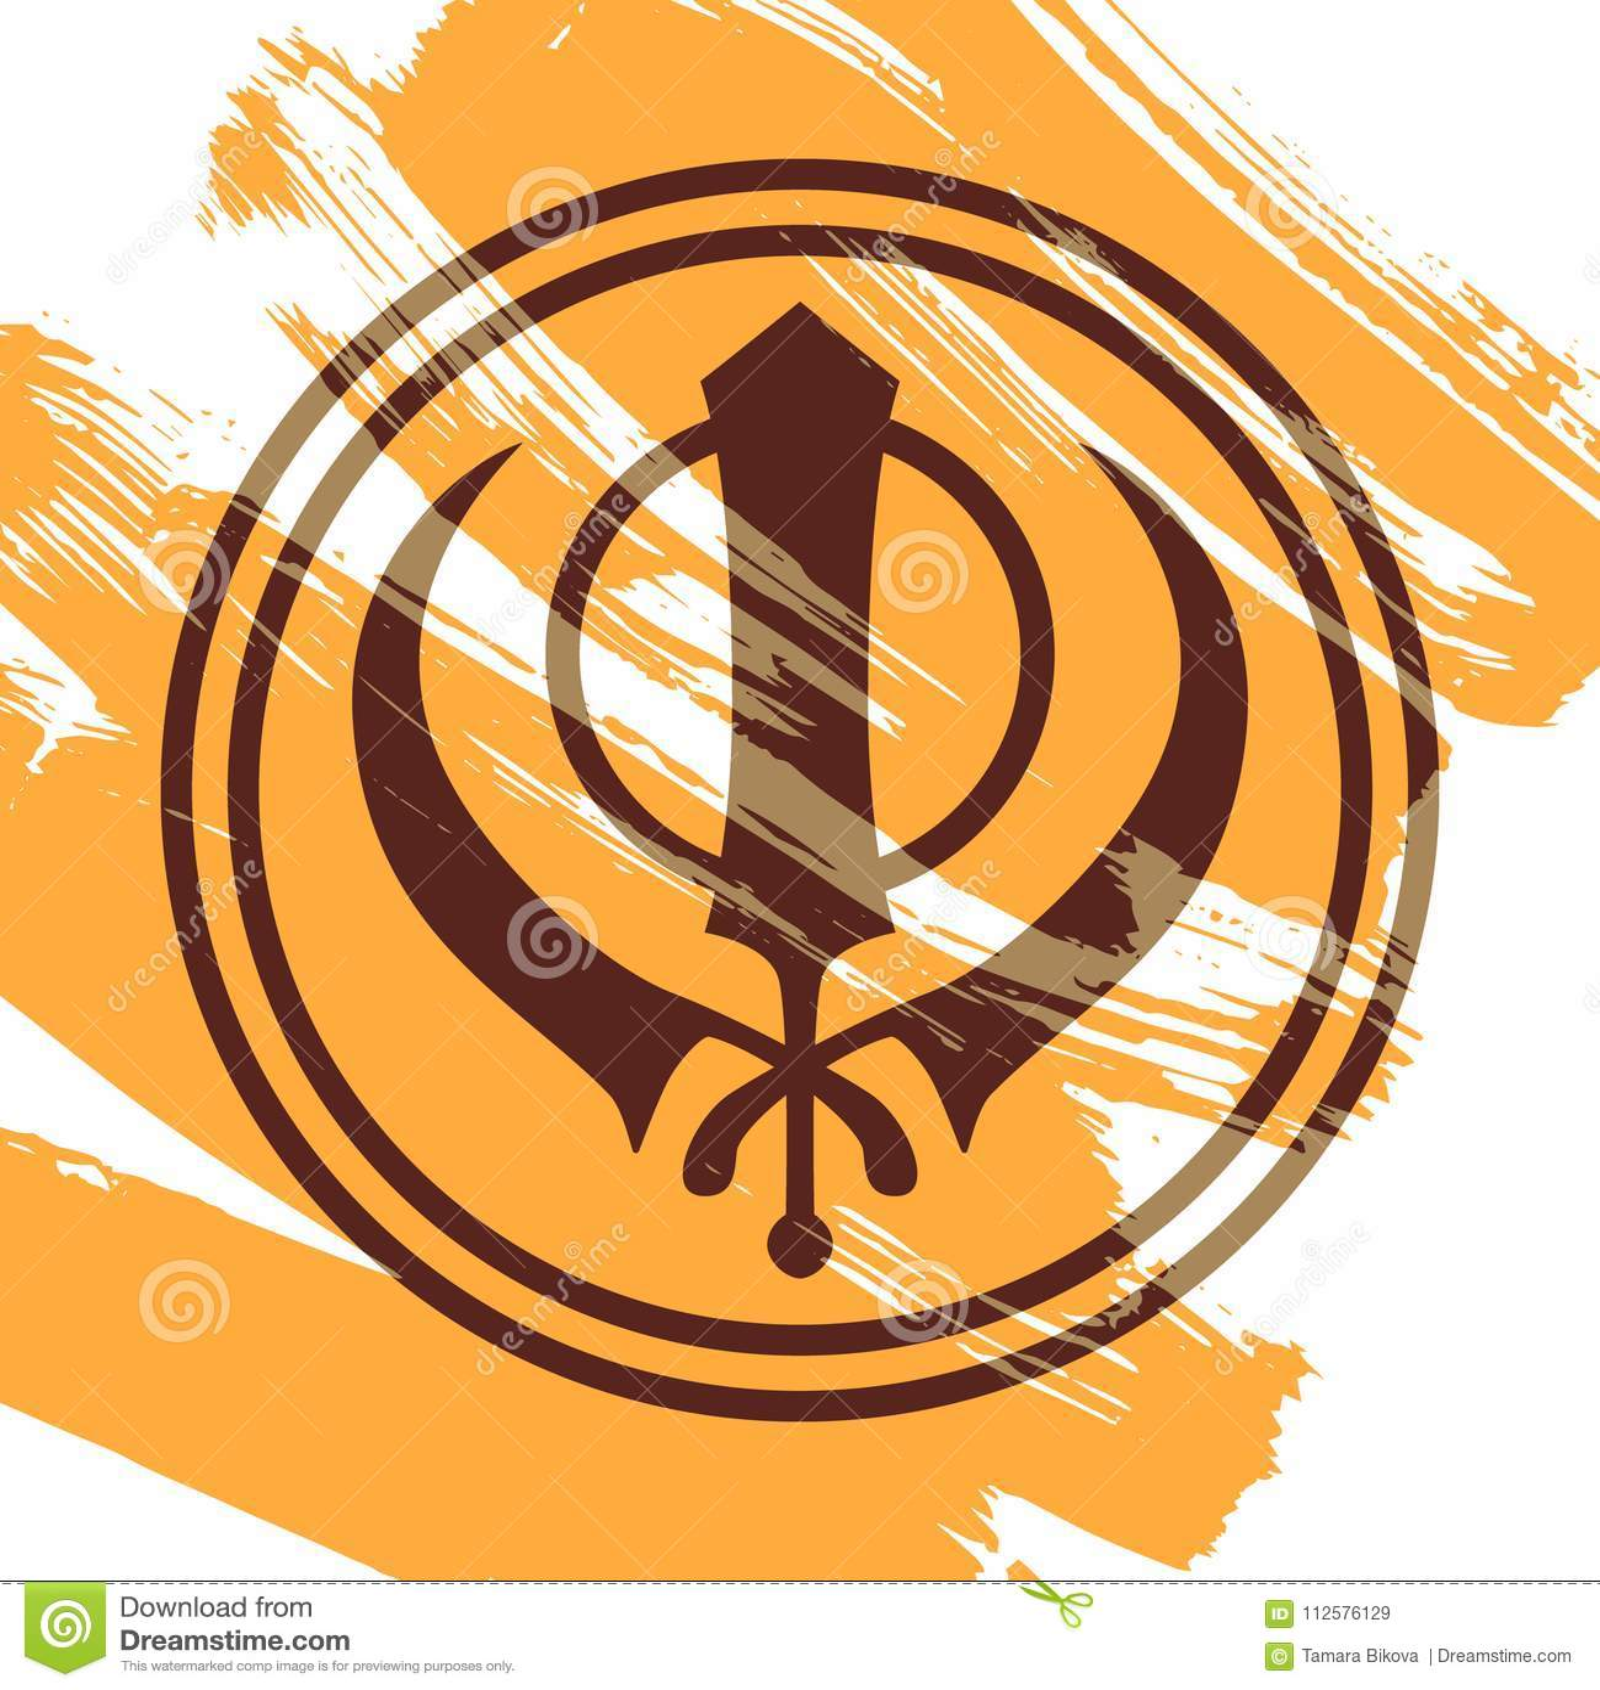 Symbol Of The Sikhs Khanda Stock Vector Illustration Of Motif